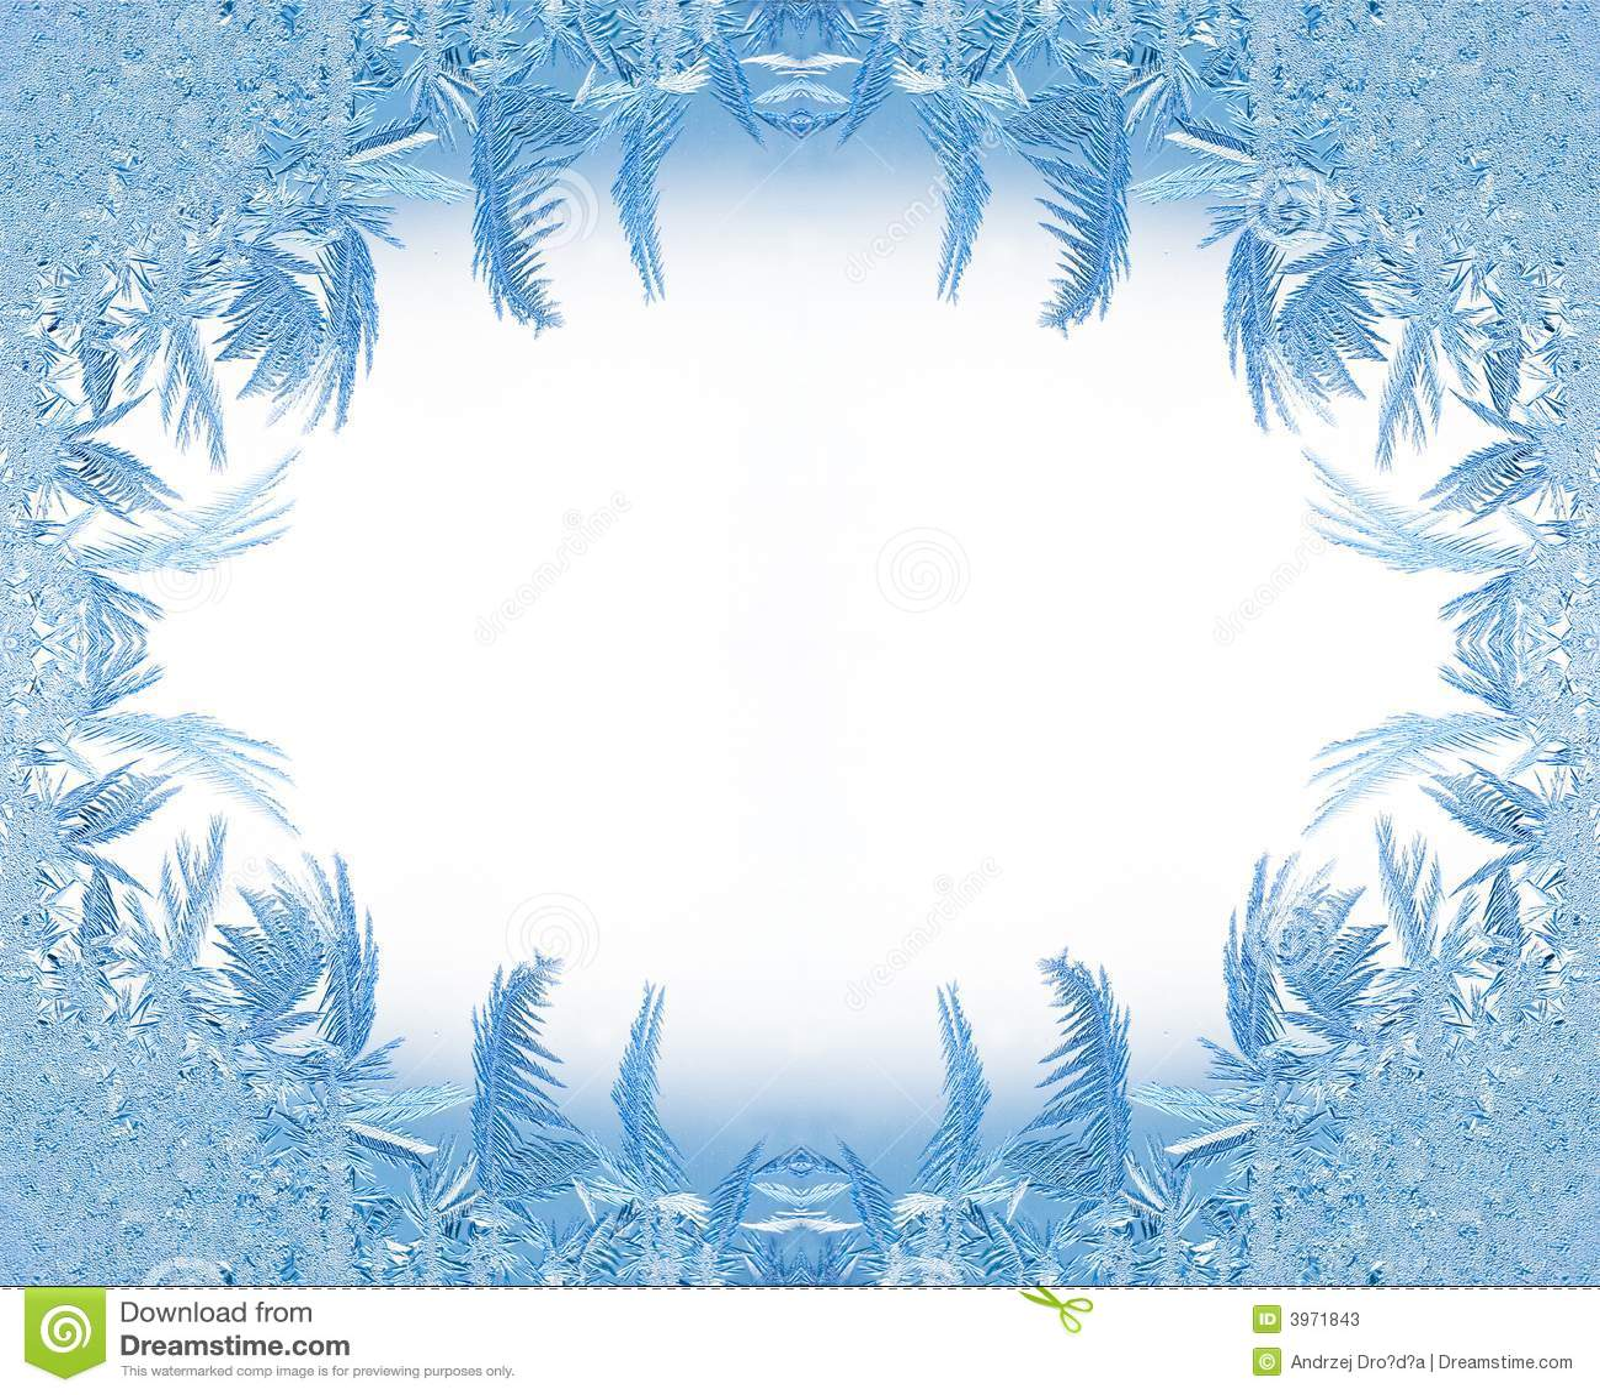 Ice Frame Stock Photos - Image: 3971843